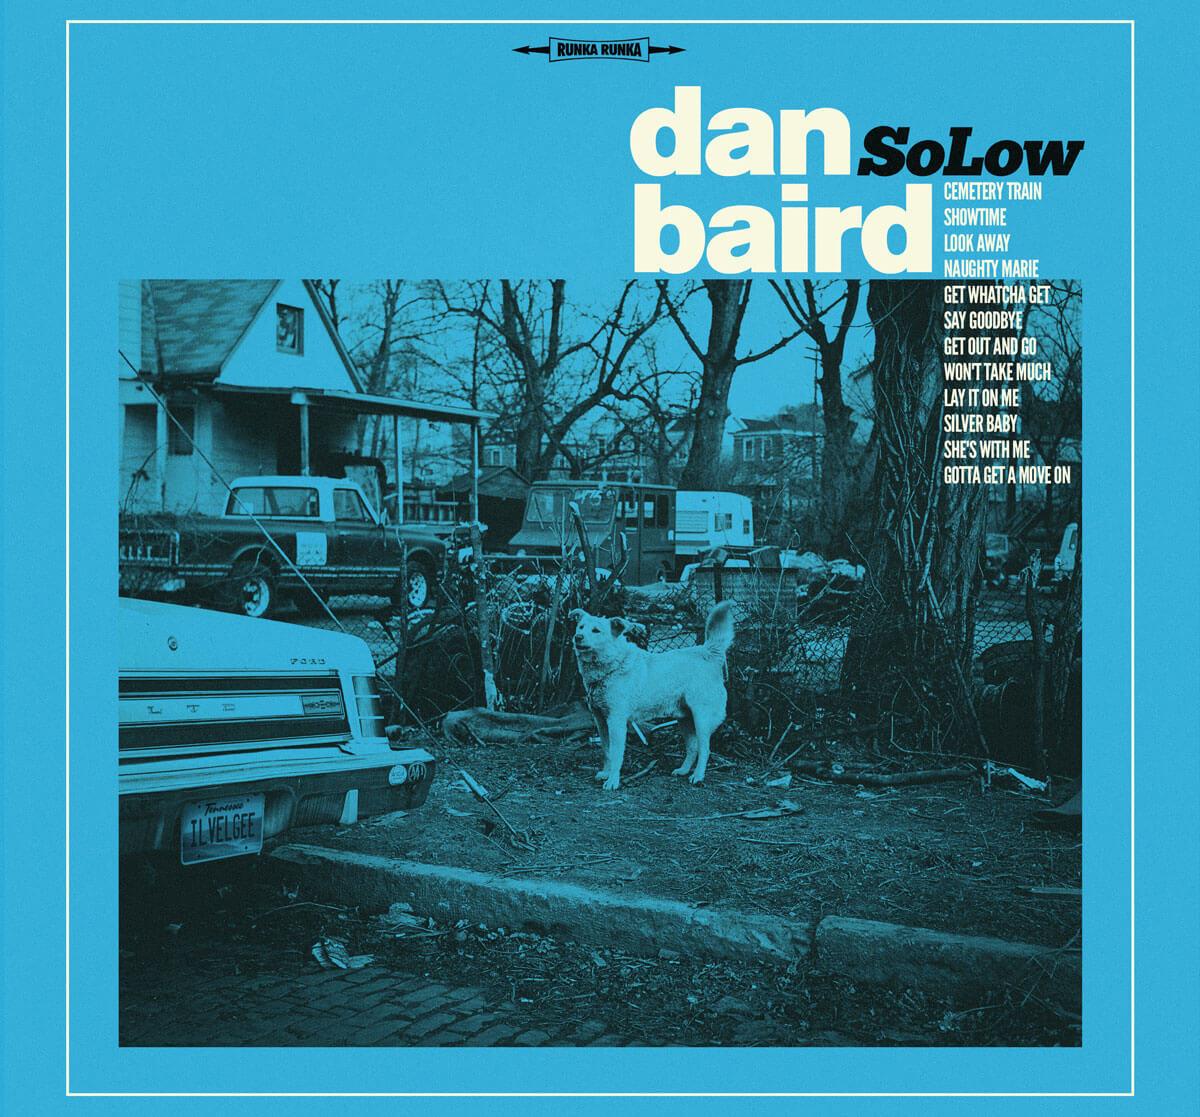 Un disco, un gif - Página 13 DB.SoLow-CD-cover